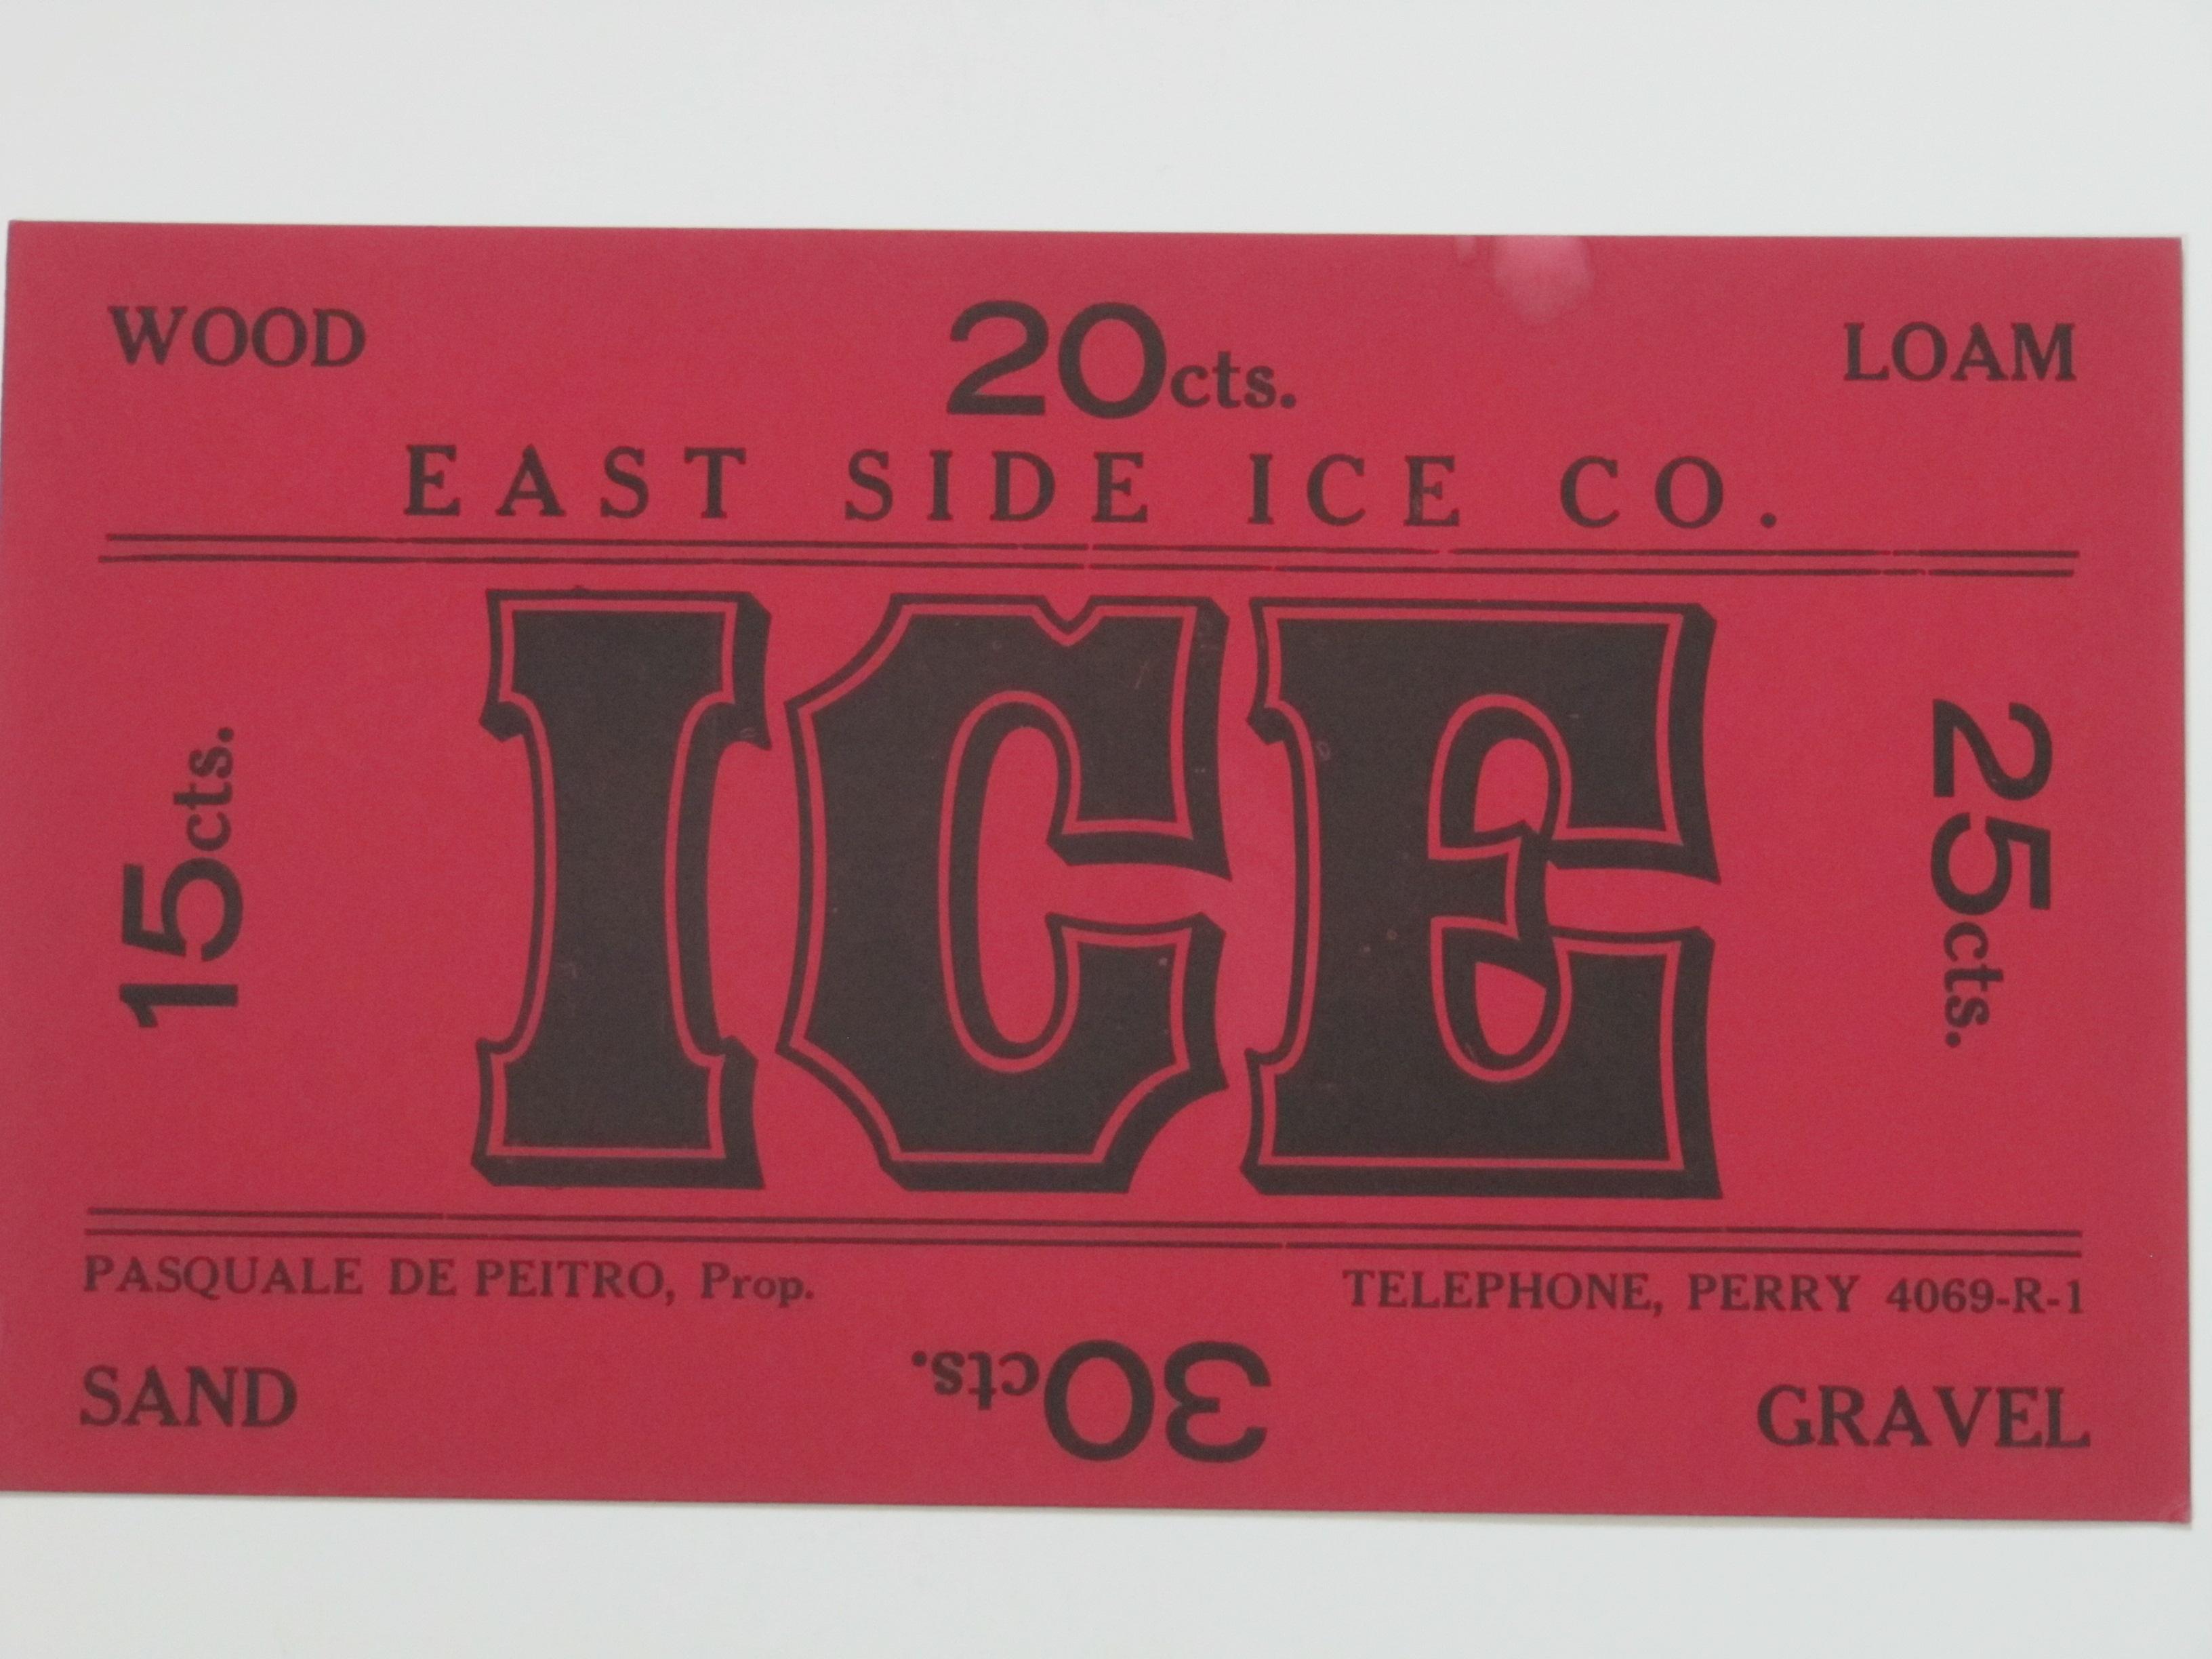 East Side Ice Co.